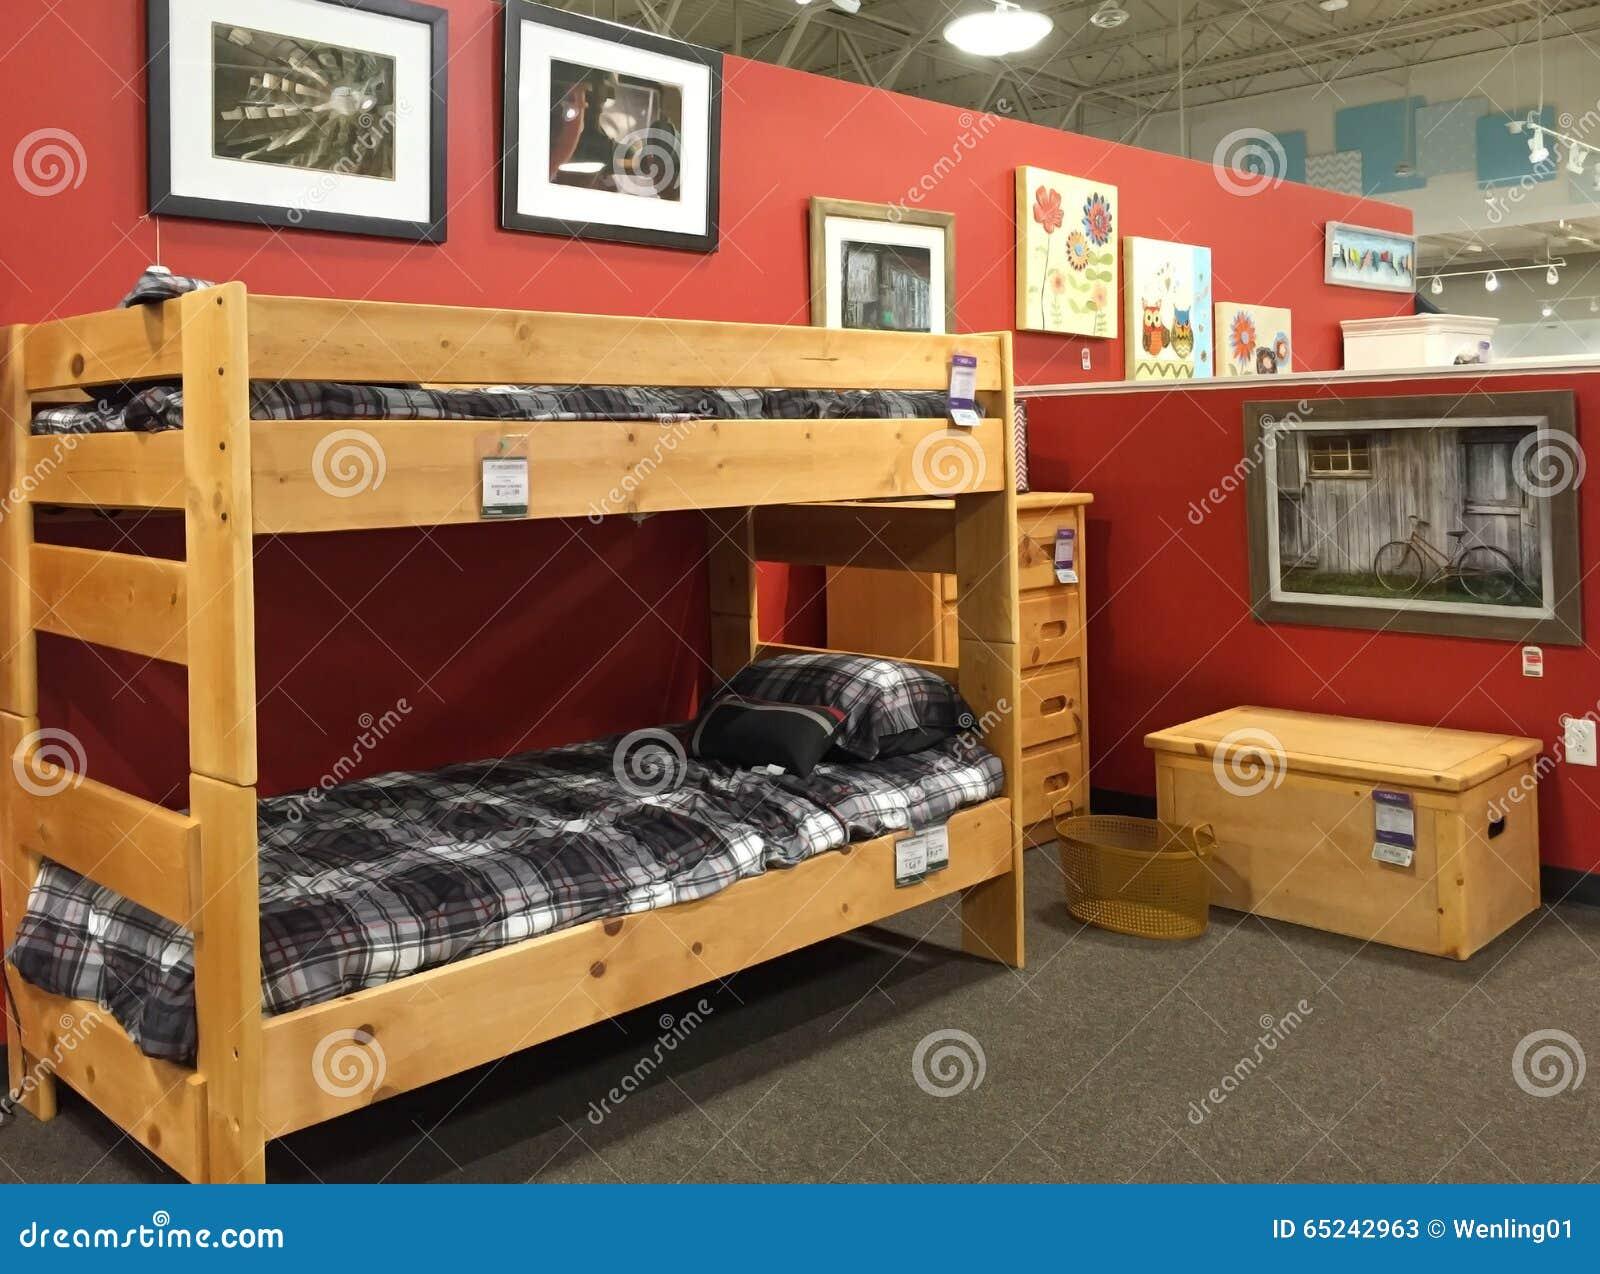 Selling Bedroom Furniture Children Bedroom Furniture Selling Editorial Stock Photo Image